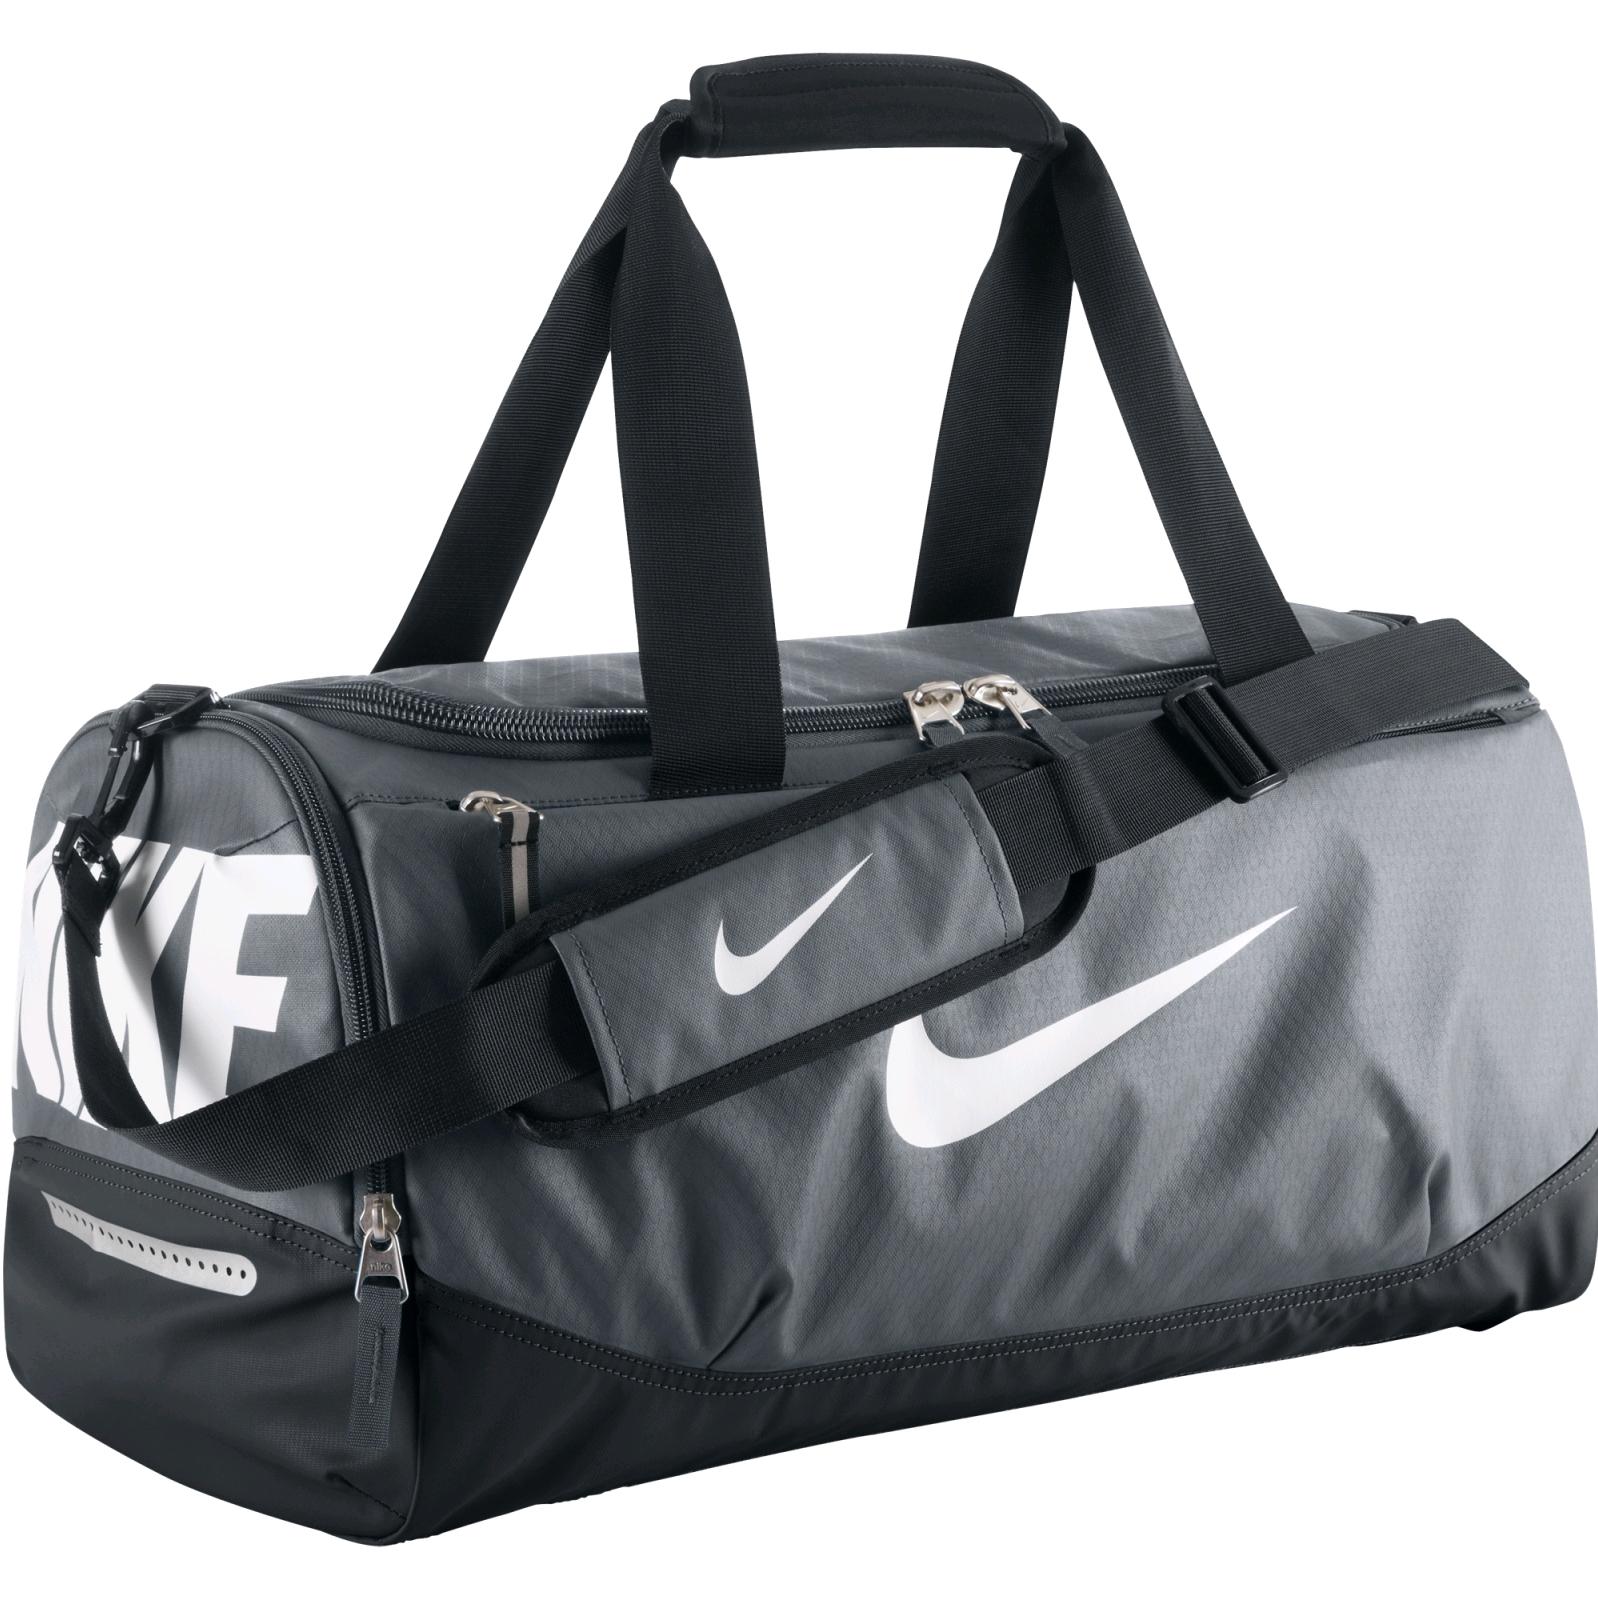 e44b2318 Спортивная сумка Nike